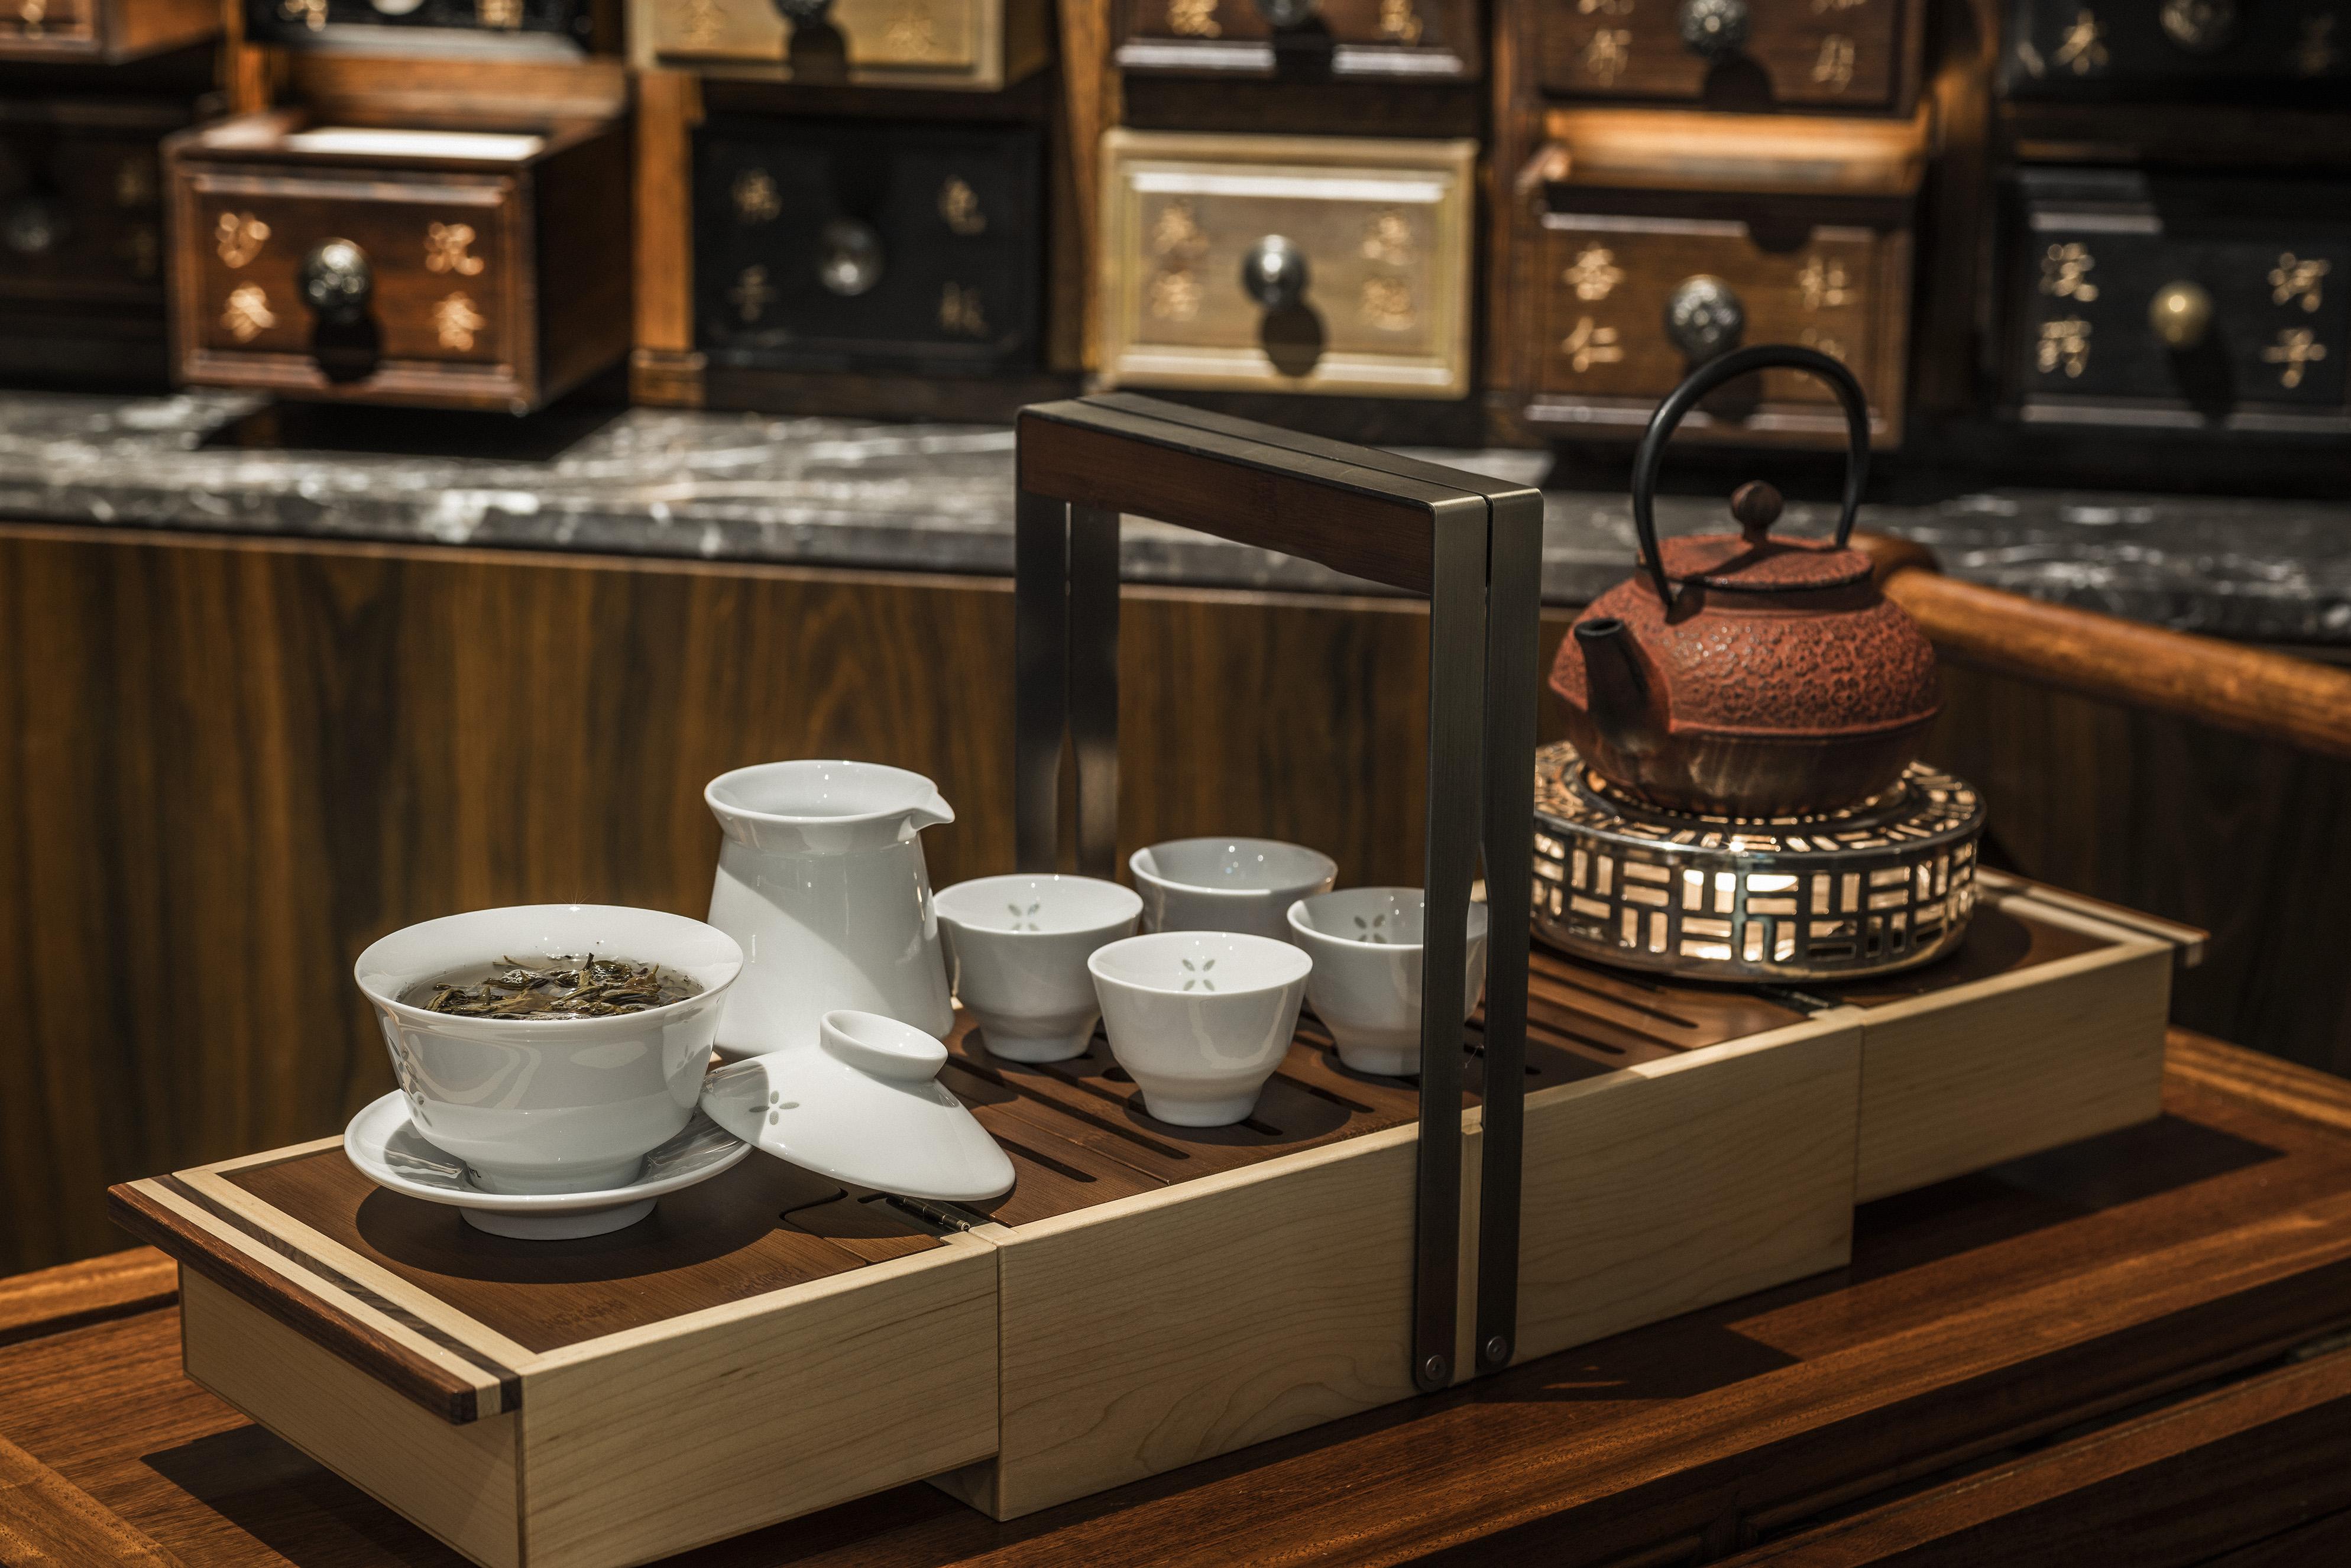 Jiang-nan chun - Premium Tea service